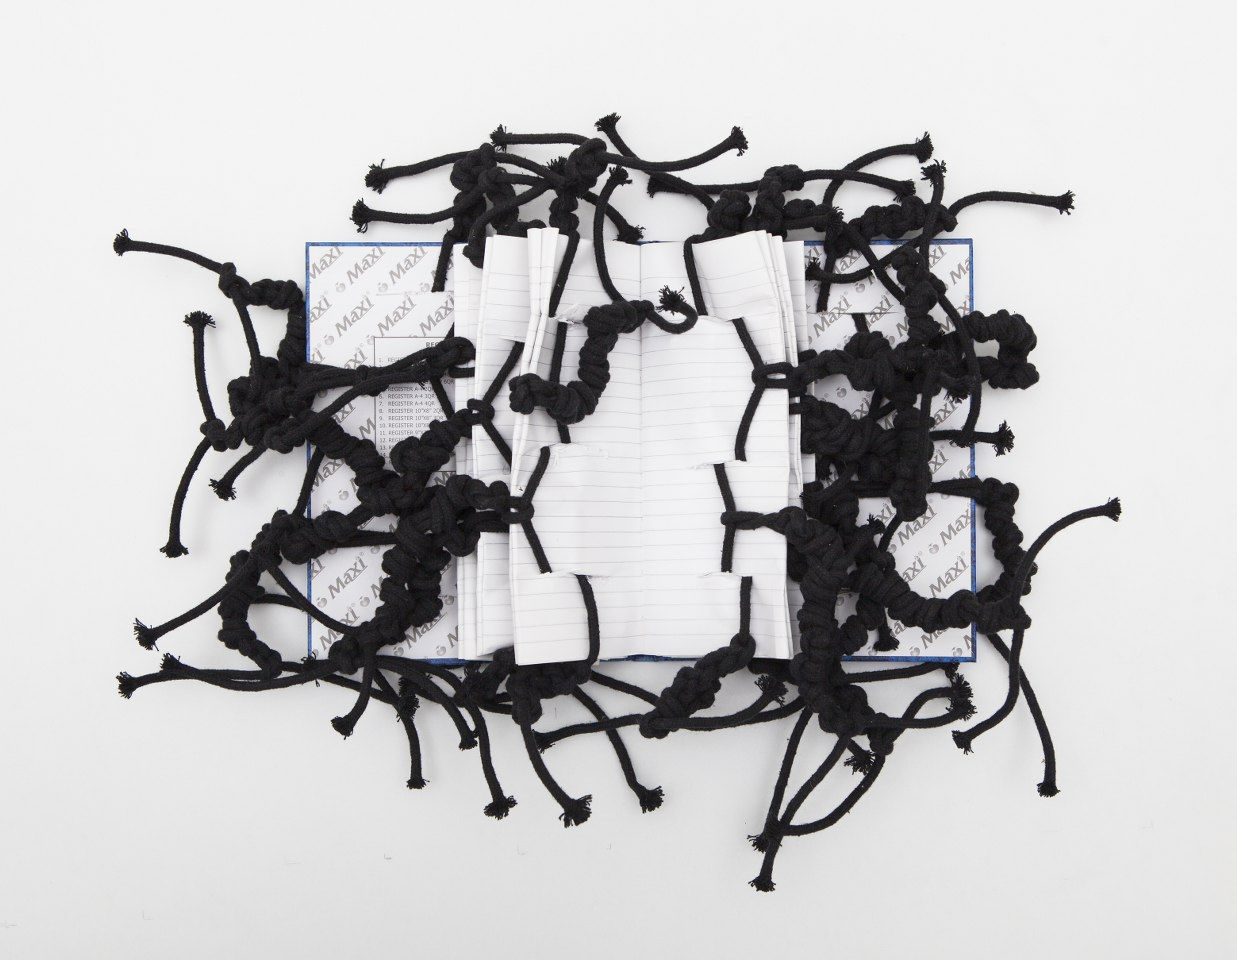 Cotton Rope No 2, 2012, Mixed Media